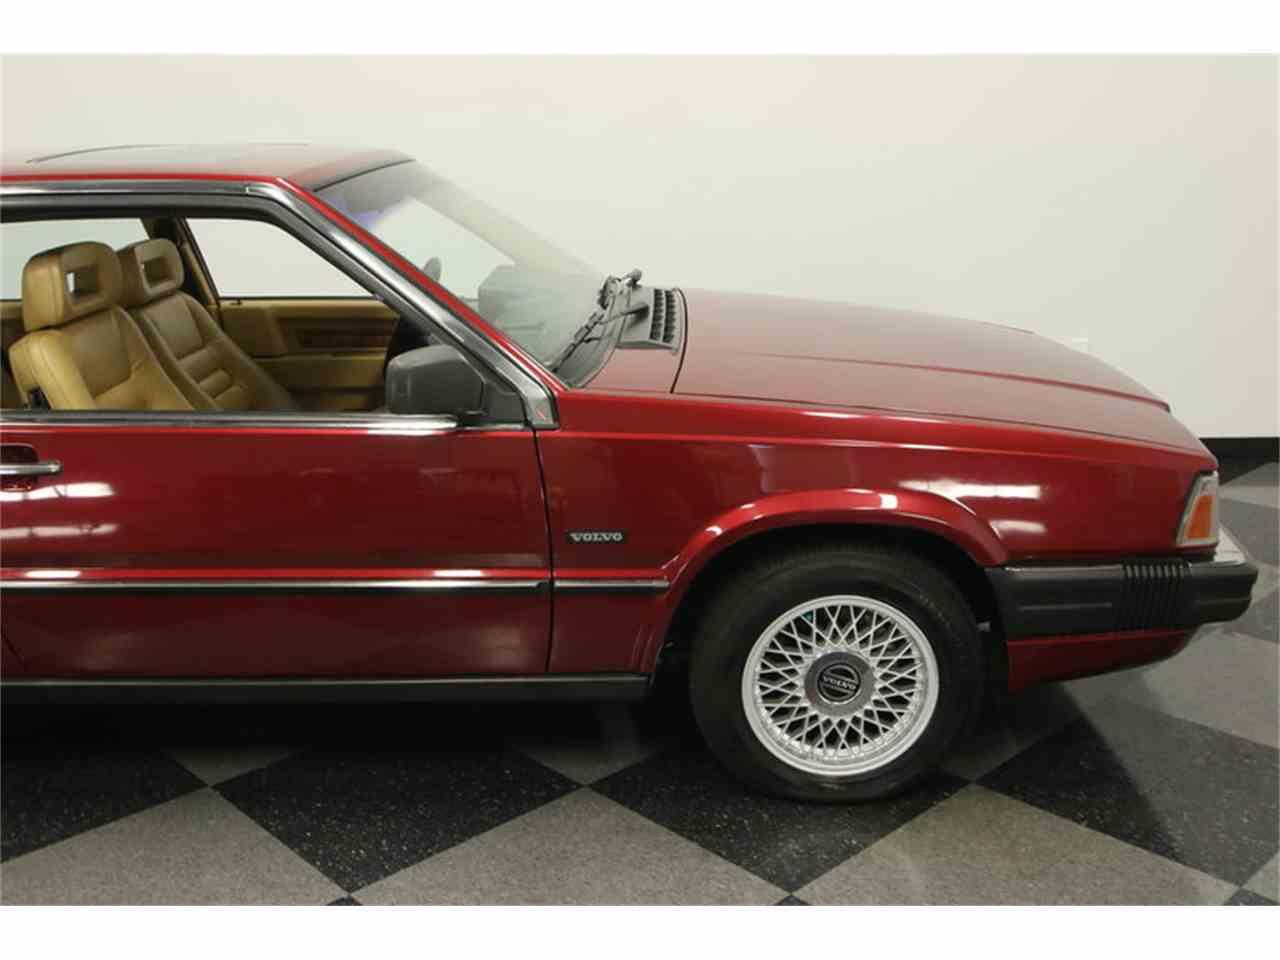 1991 Volvo Bertone 780 Turbo Coupe for Sale | ClassicCars.com | CC-1061534